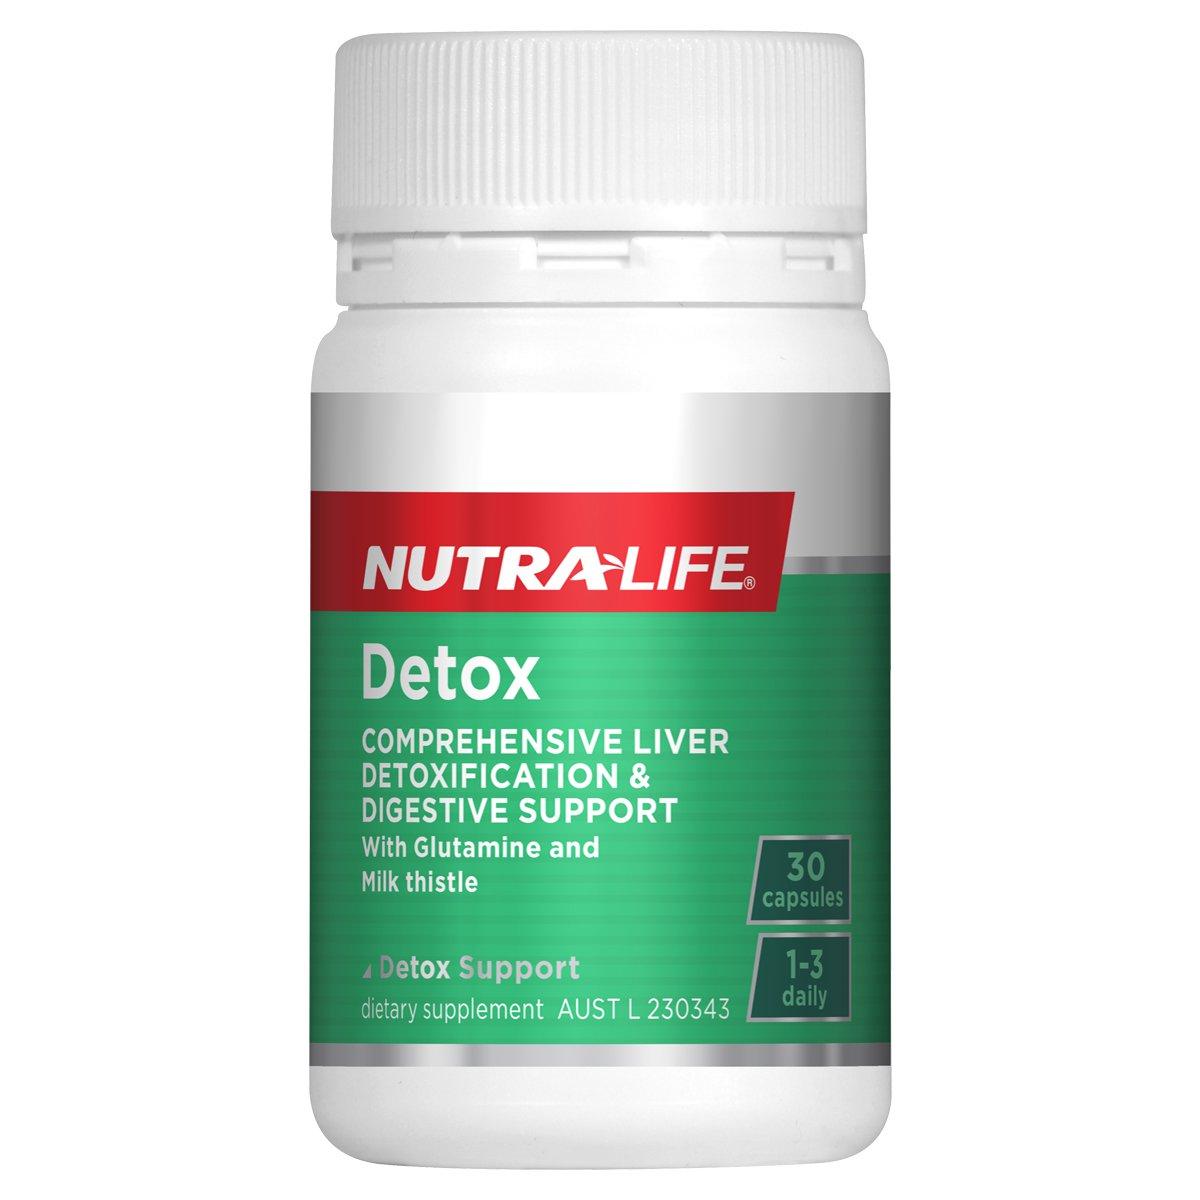 Buy Nutra Life Detox Online 30 Caps